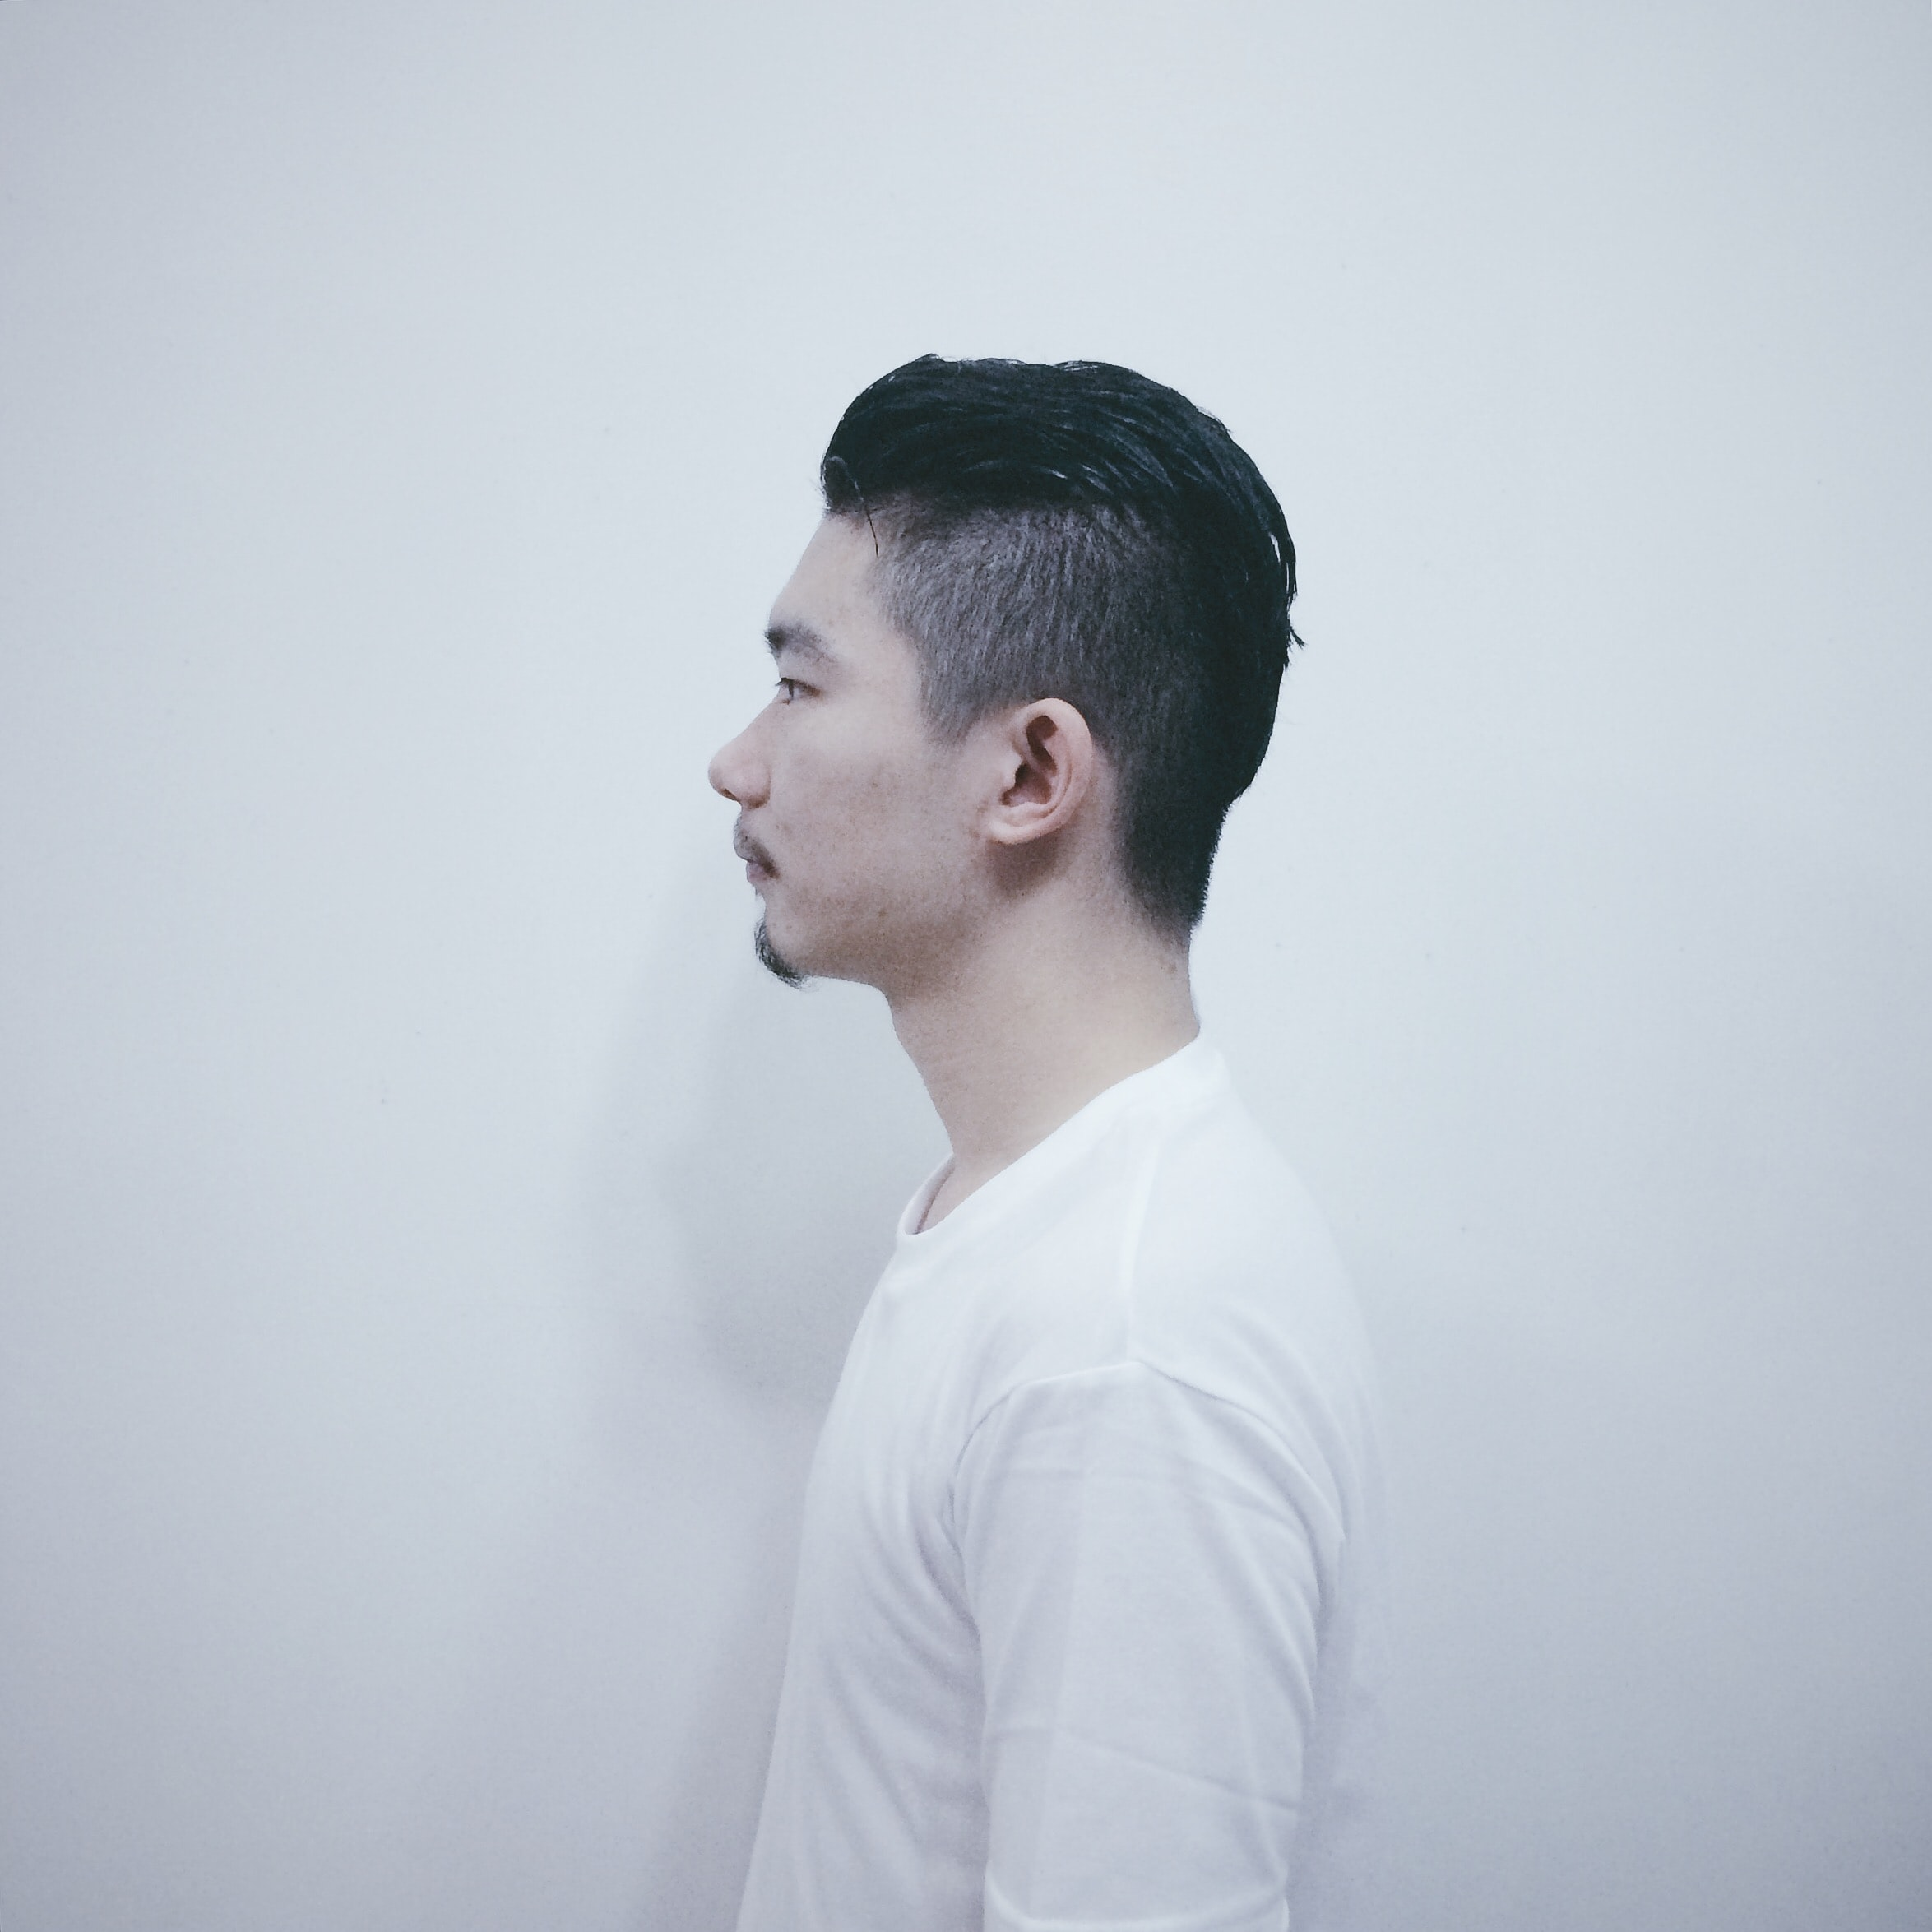 Go to David Chong Zs's profile